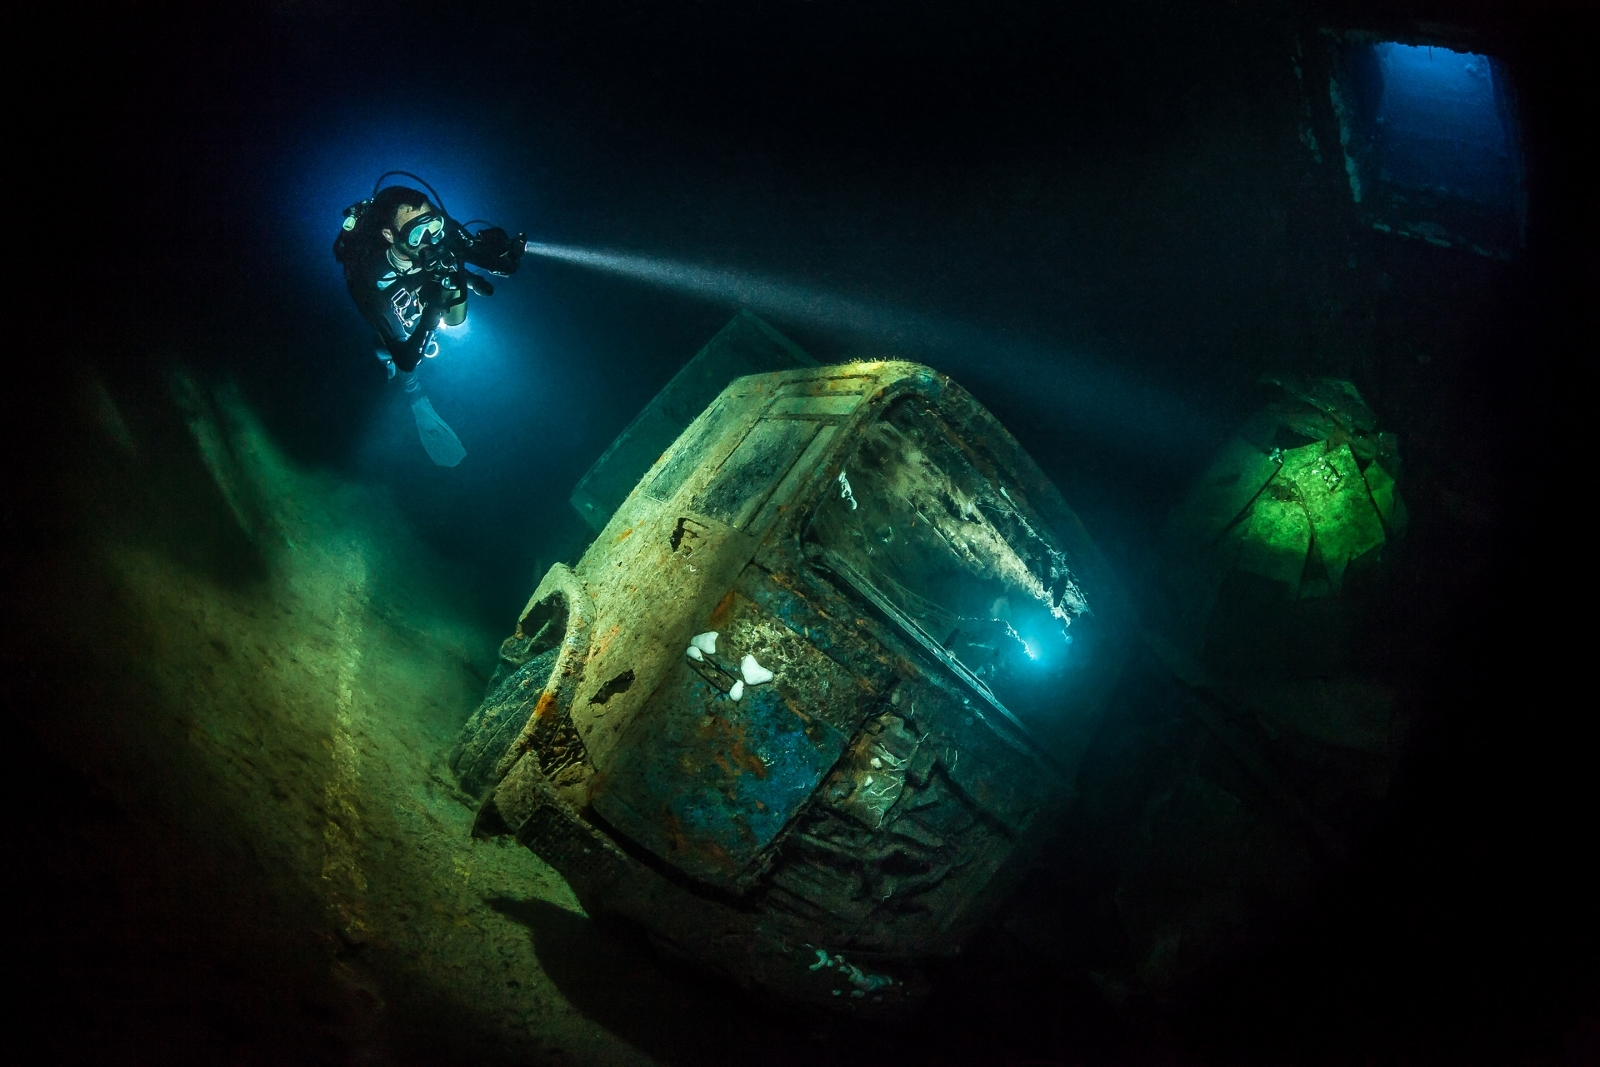 Underwater Photographer of the Year 2018